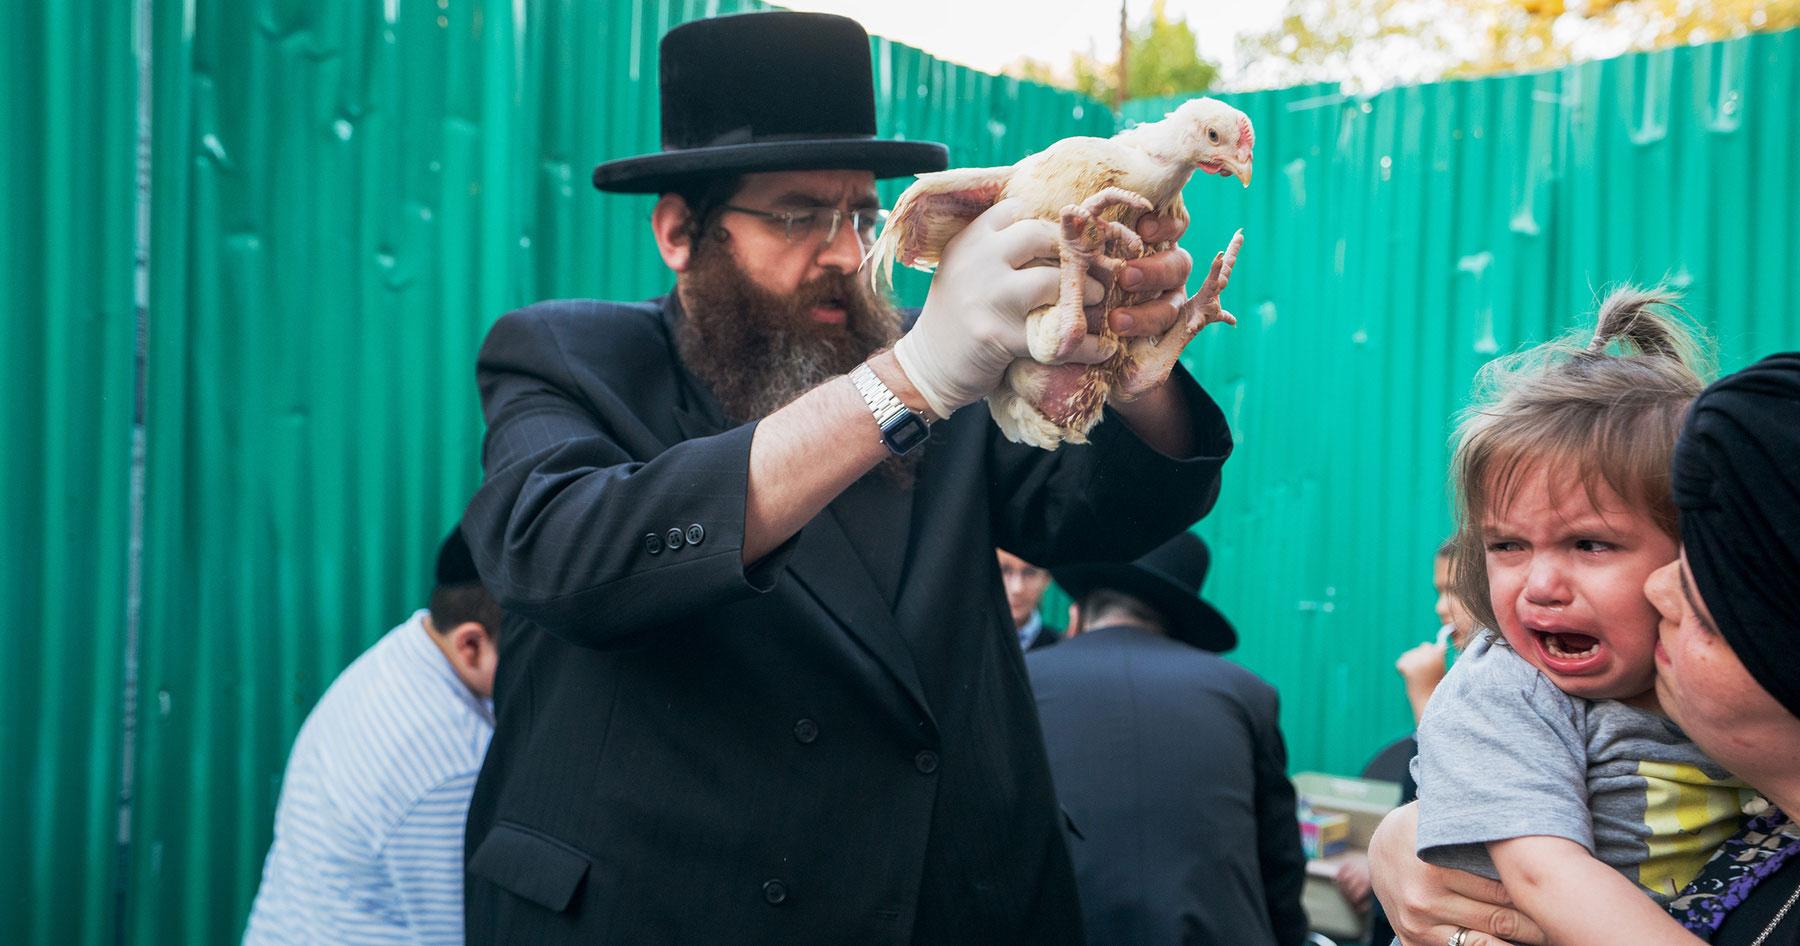 Kaporos ritual terrifies child and chicken